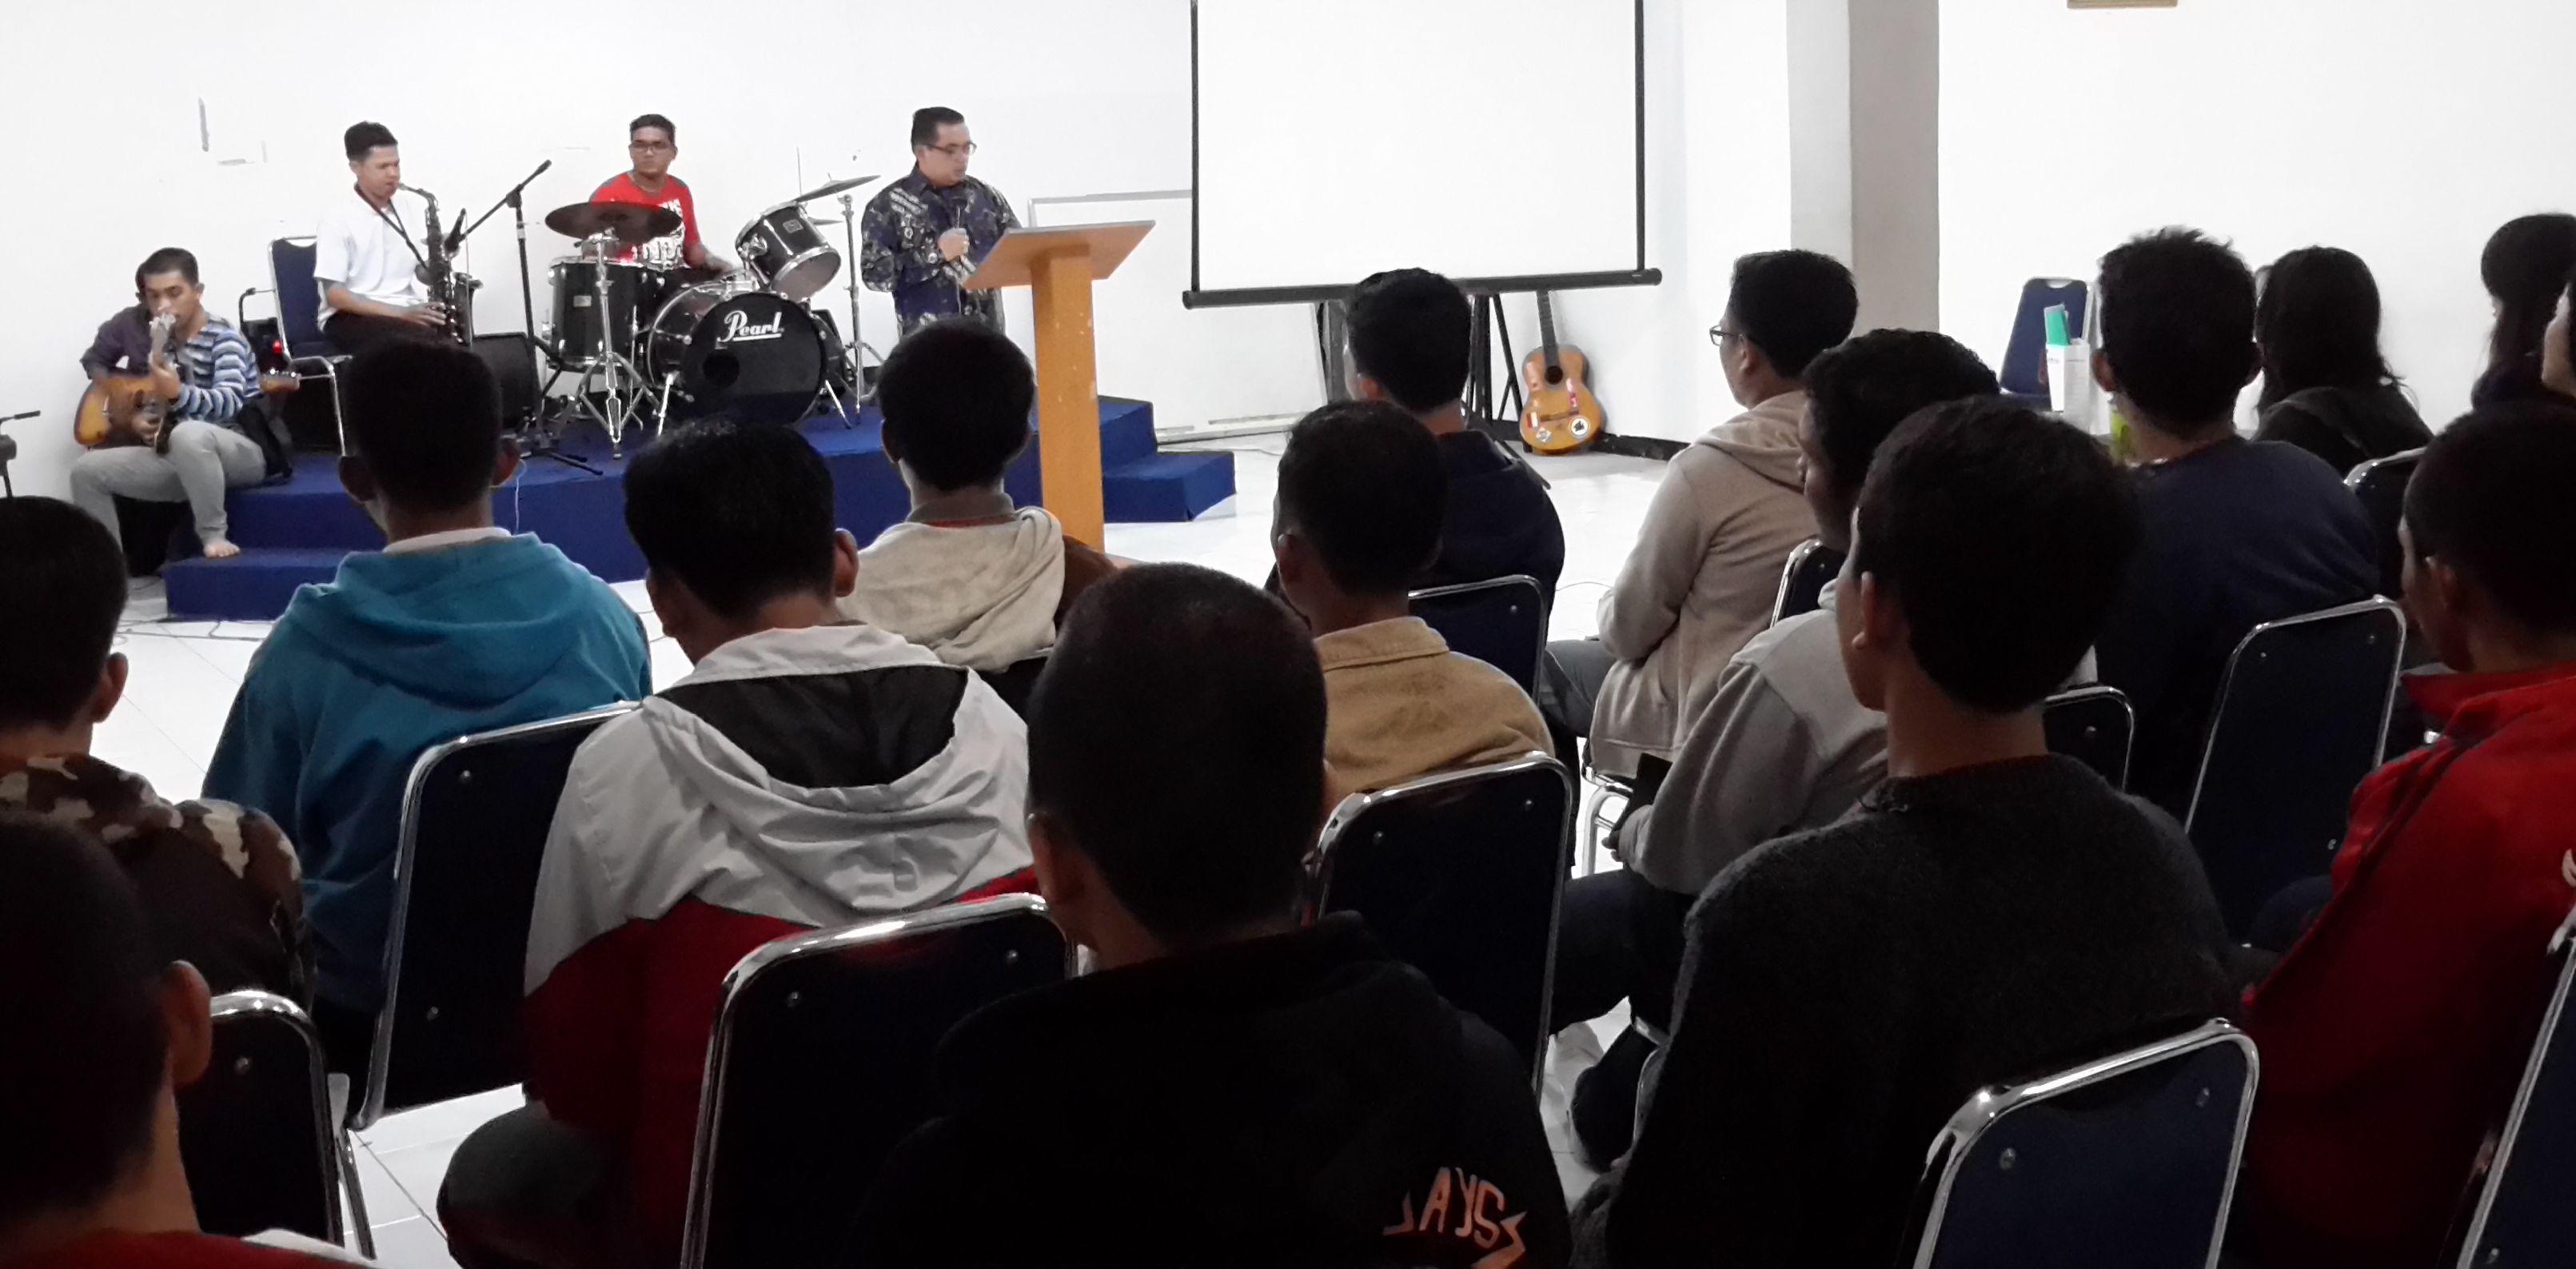 Khotbah di Retret Sidi HKBP Kota bumi -Tangerang .DI PUNCAK 15 MEI 2015